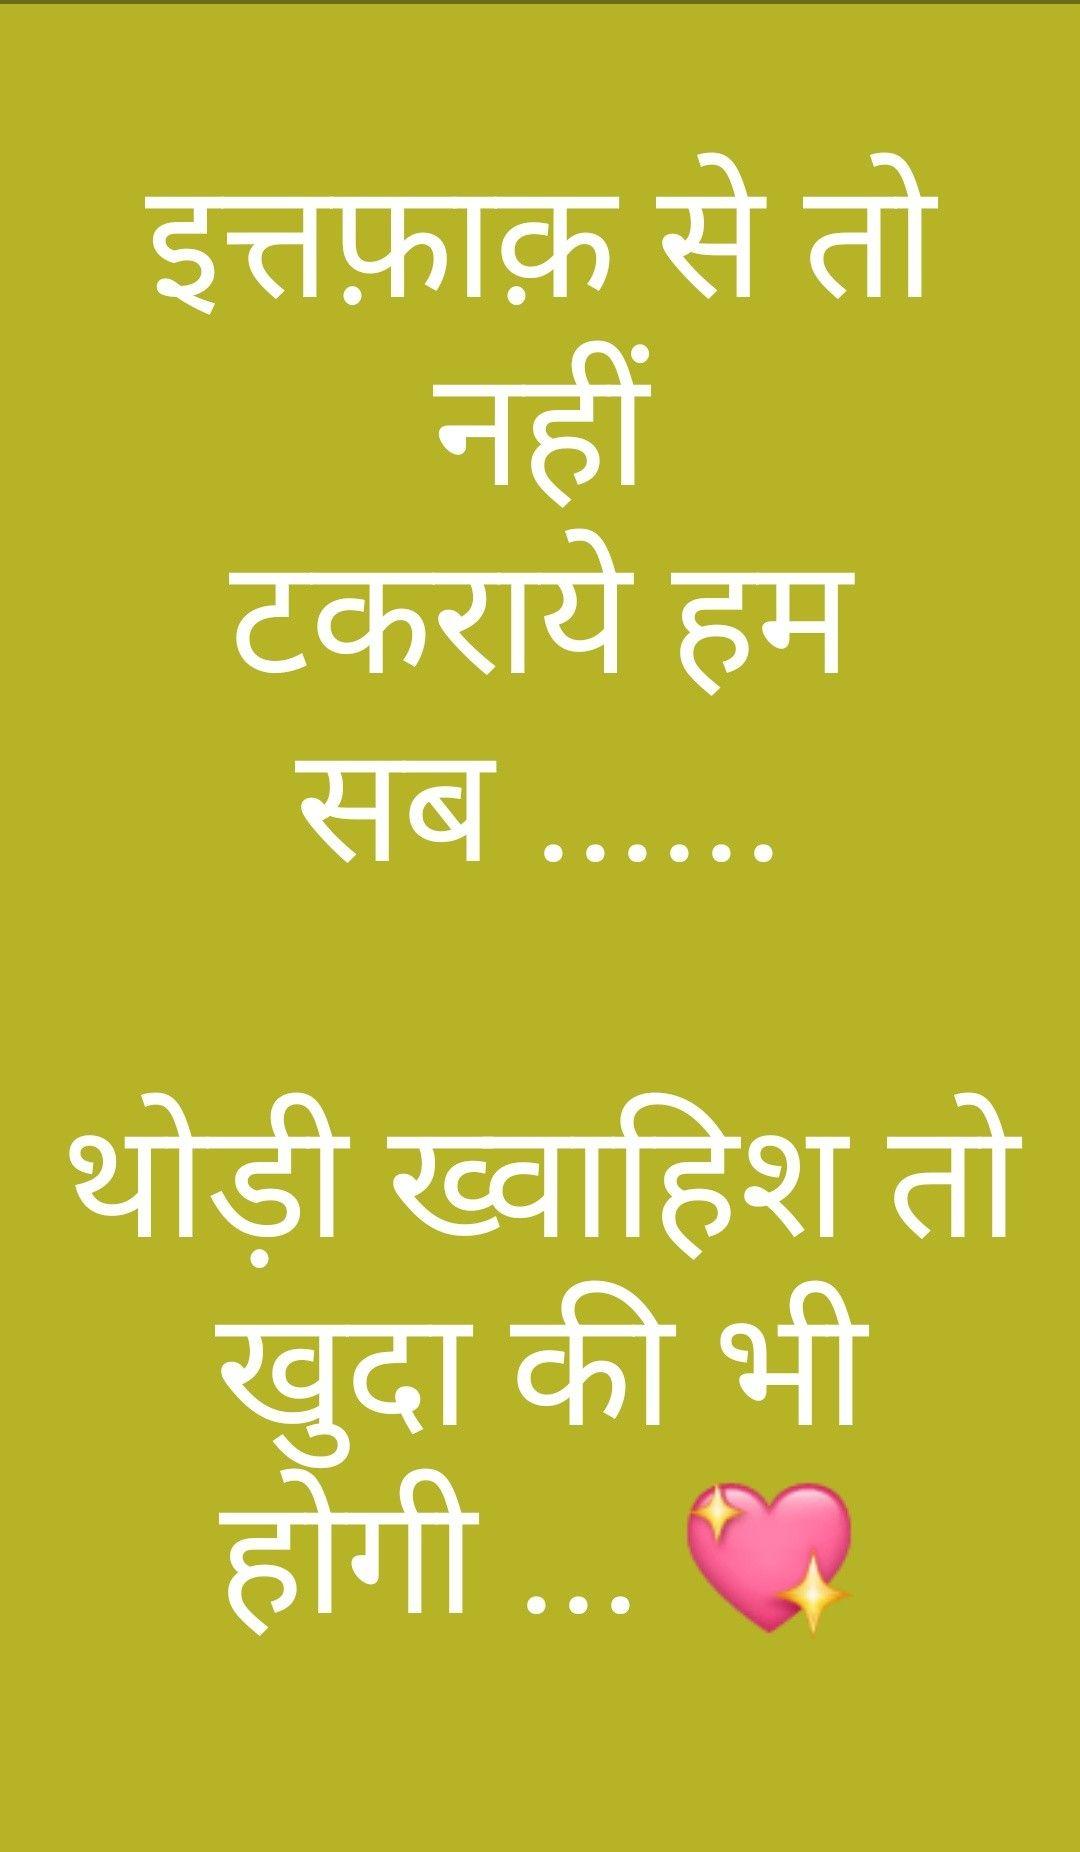 Pin By Aradhna Kushwah On Iℓ ƙ Aℓfaaʑ Zindagi Quotes Life Quotes Motivational Poems